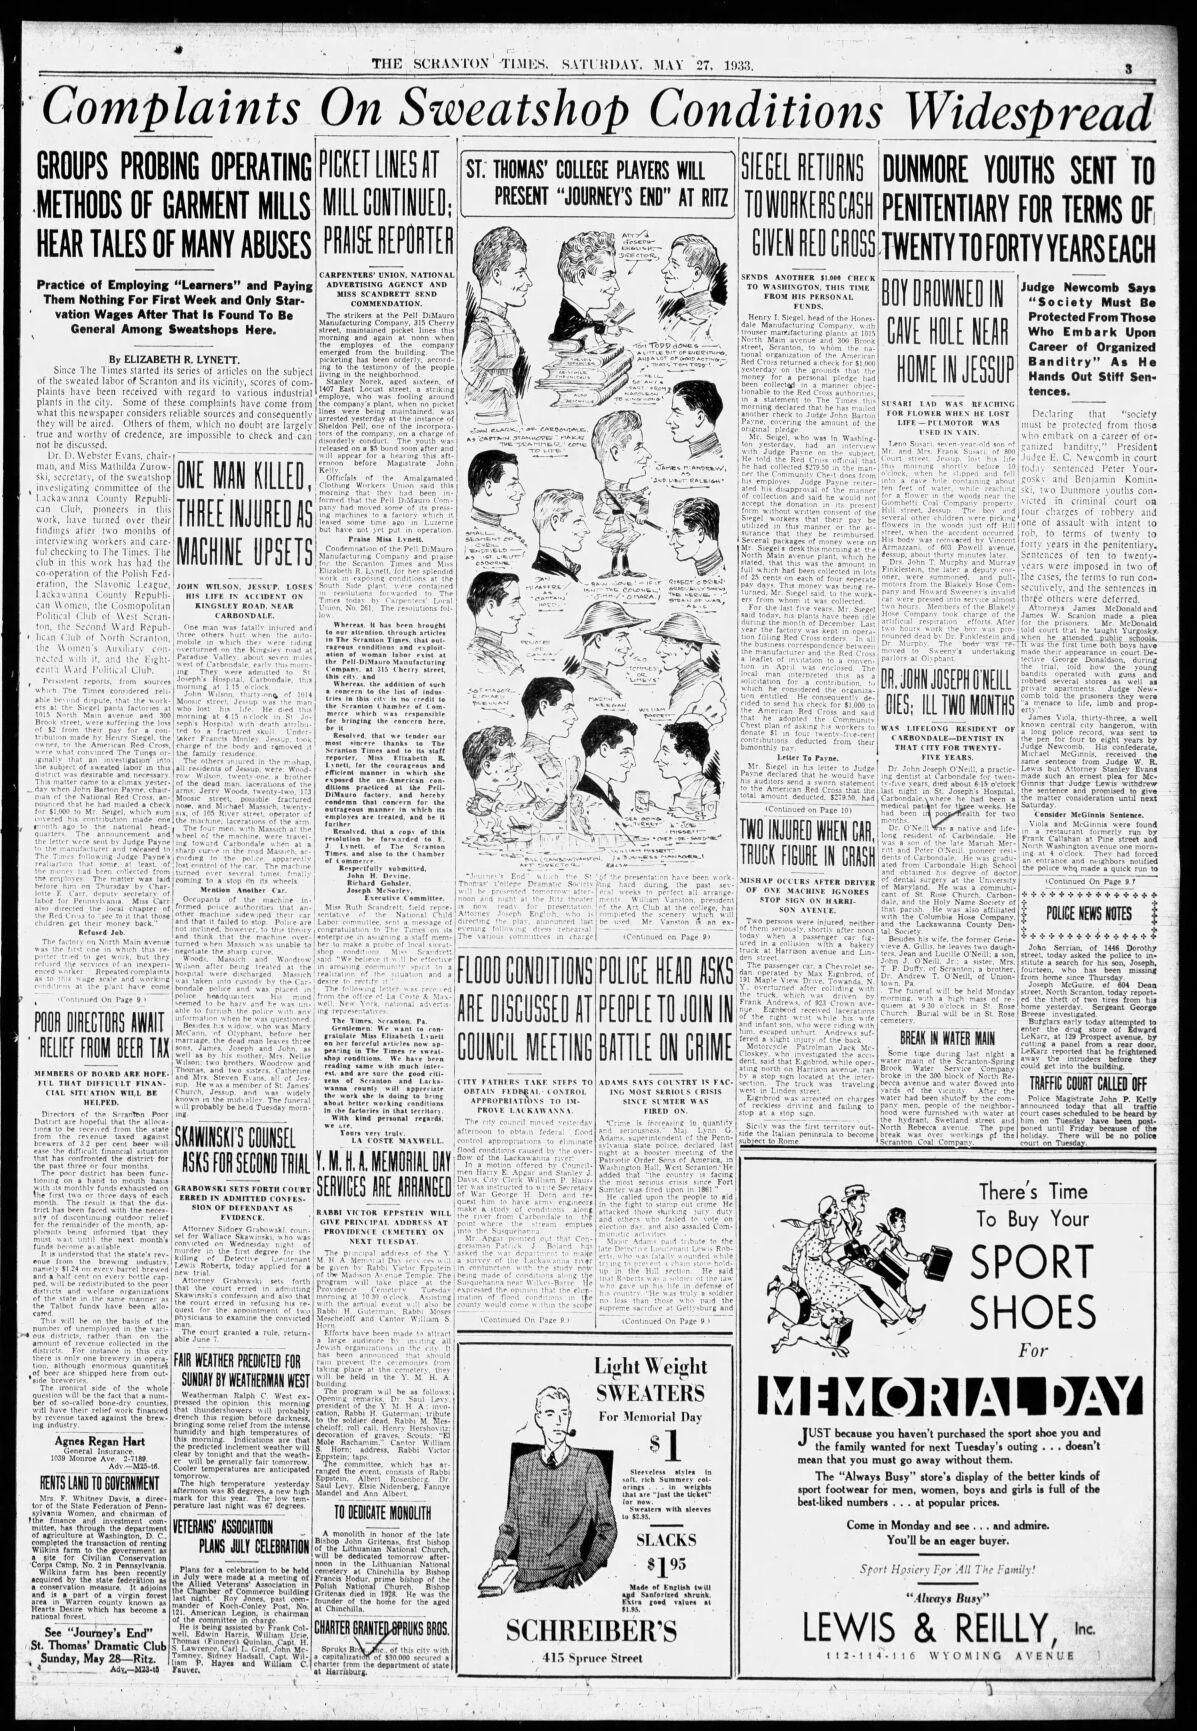 The_Times_Tribune_Sat__May_27__1933_.jpg